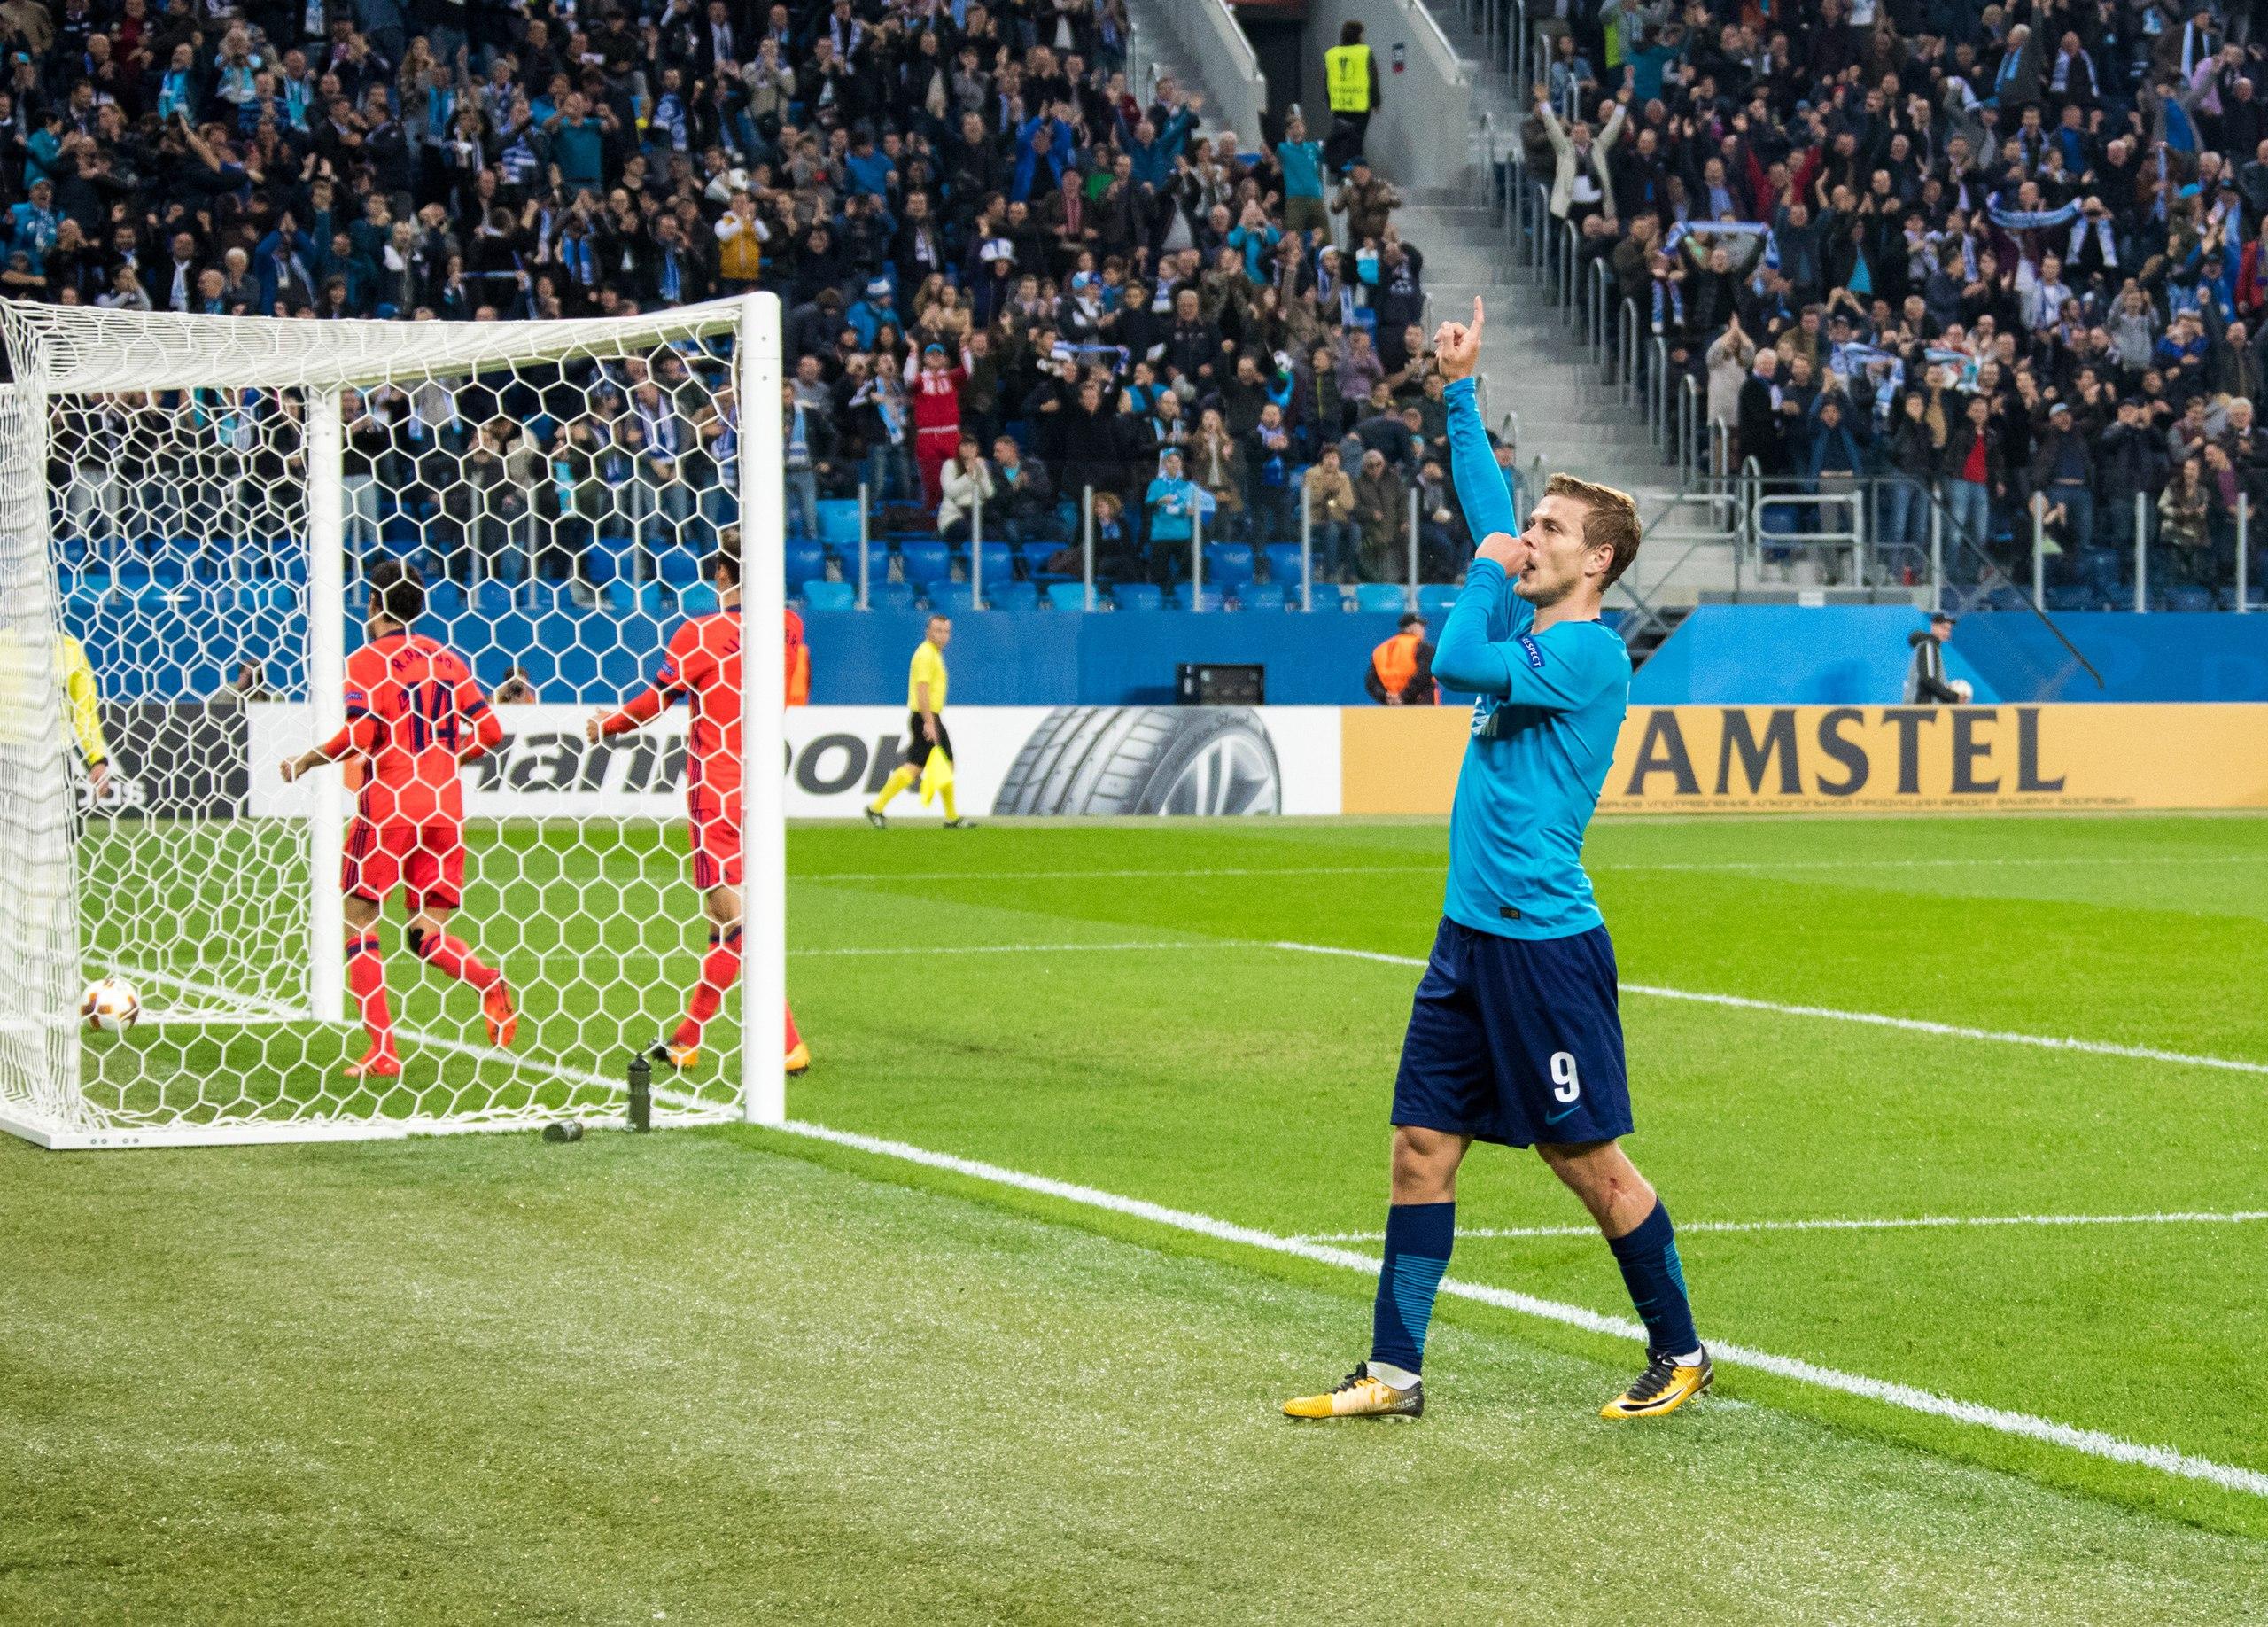 403. Zenit St. Petersburg (RUS) - Real Sociedad (ESP) 3:1